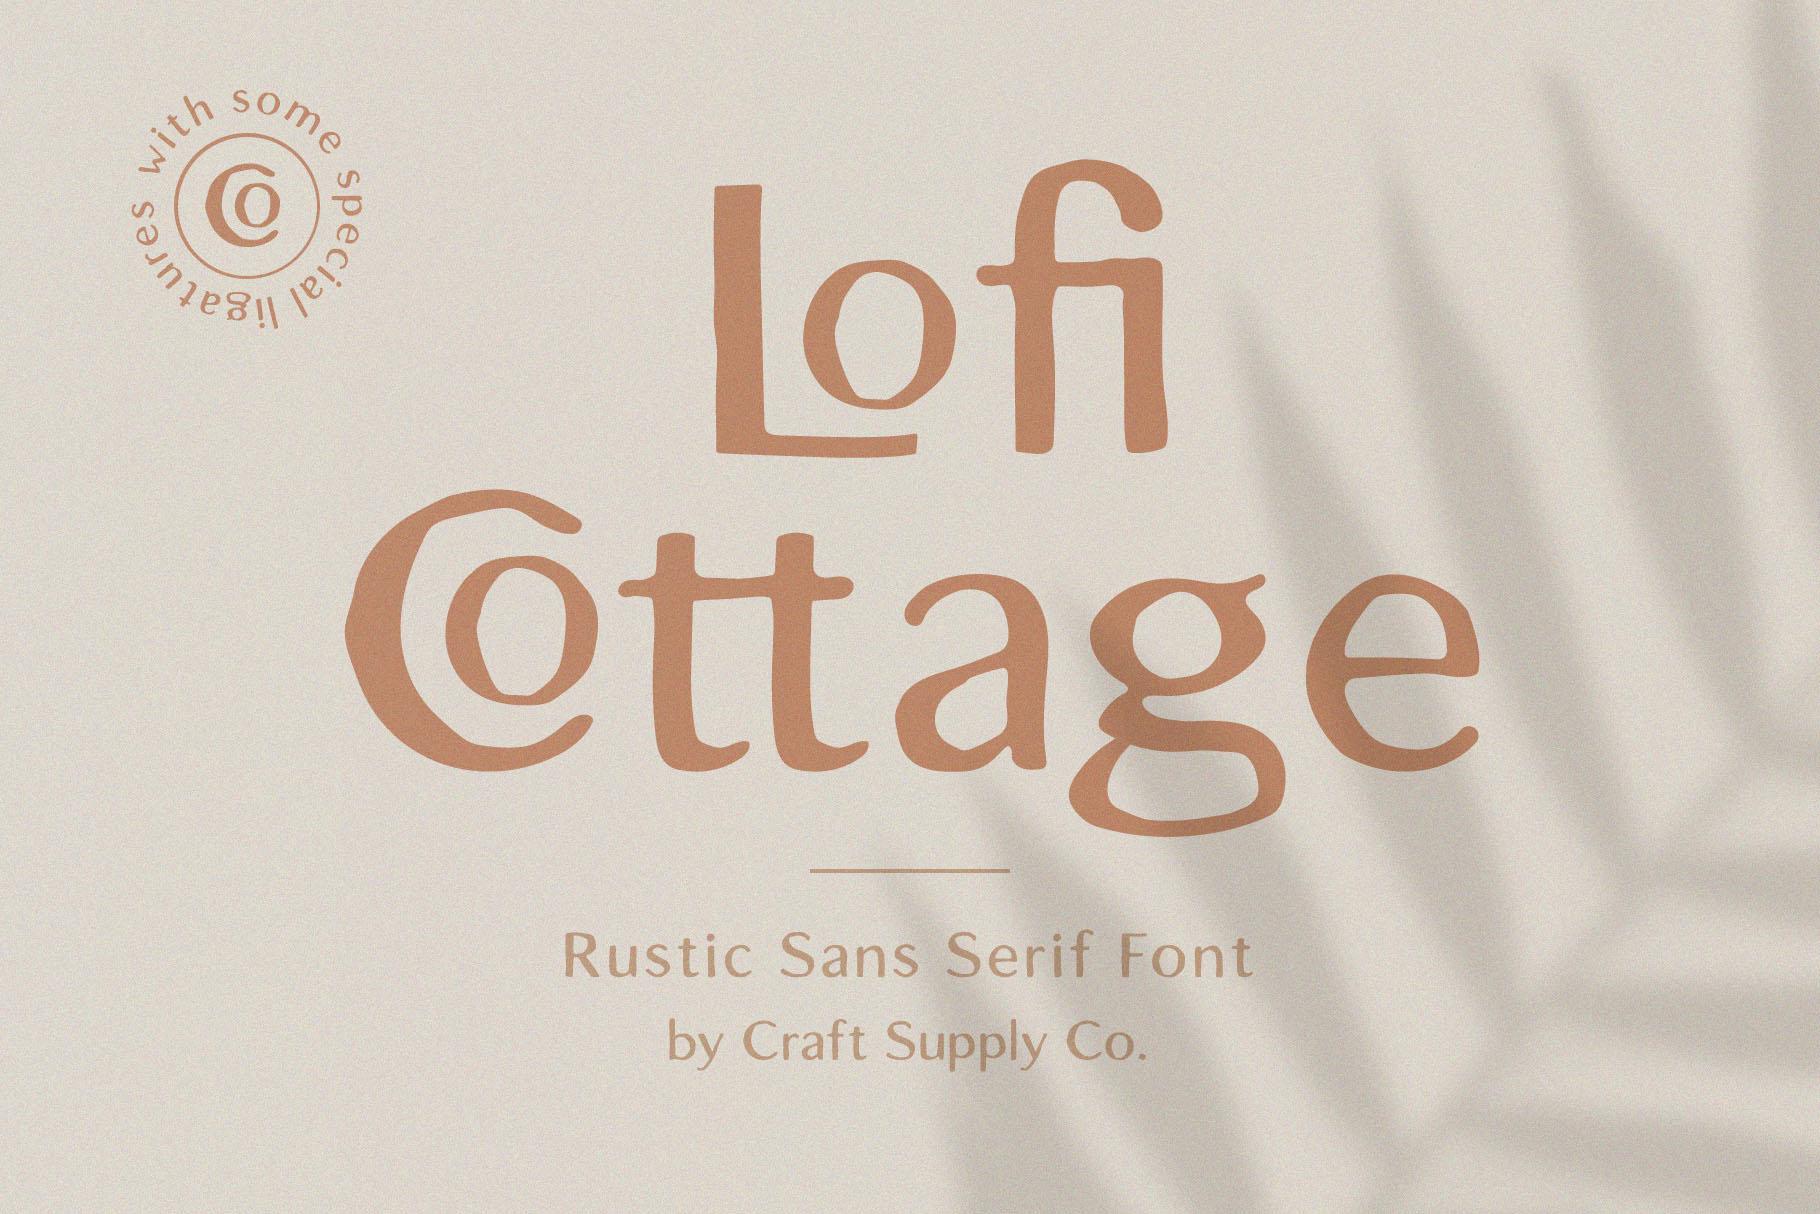 Lofi Cottage - Rustic Sans Serif example image 1